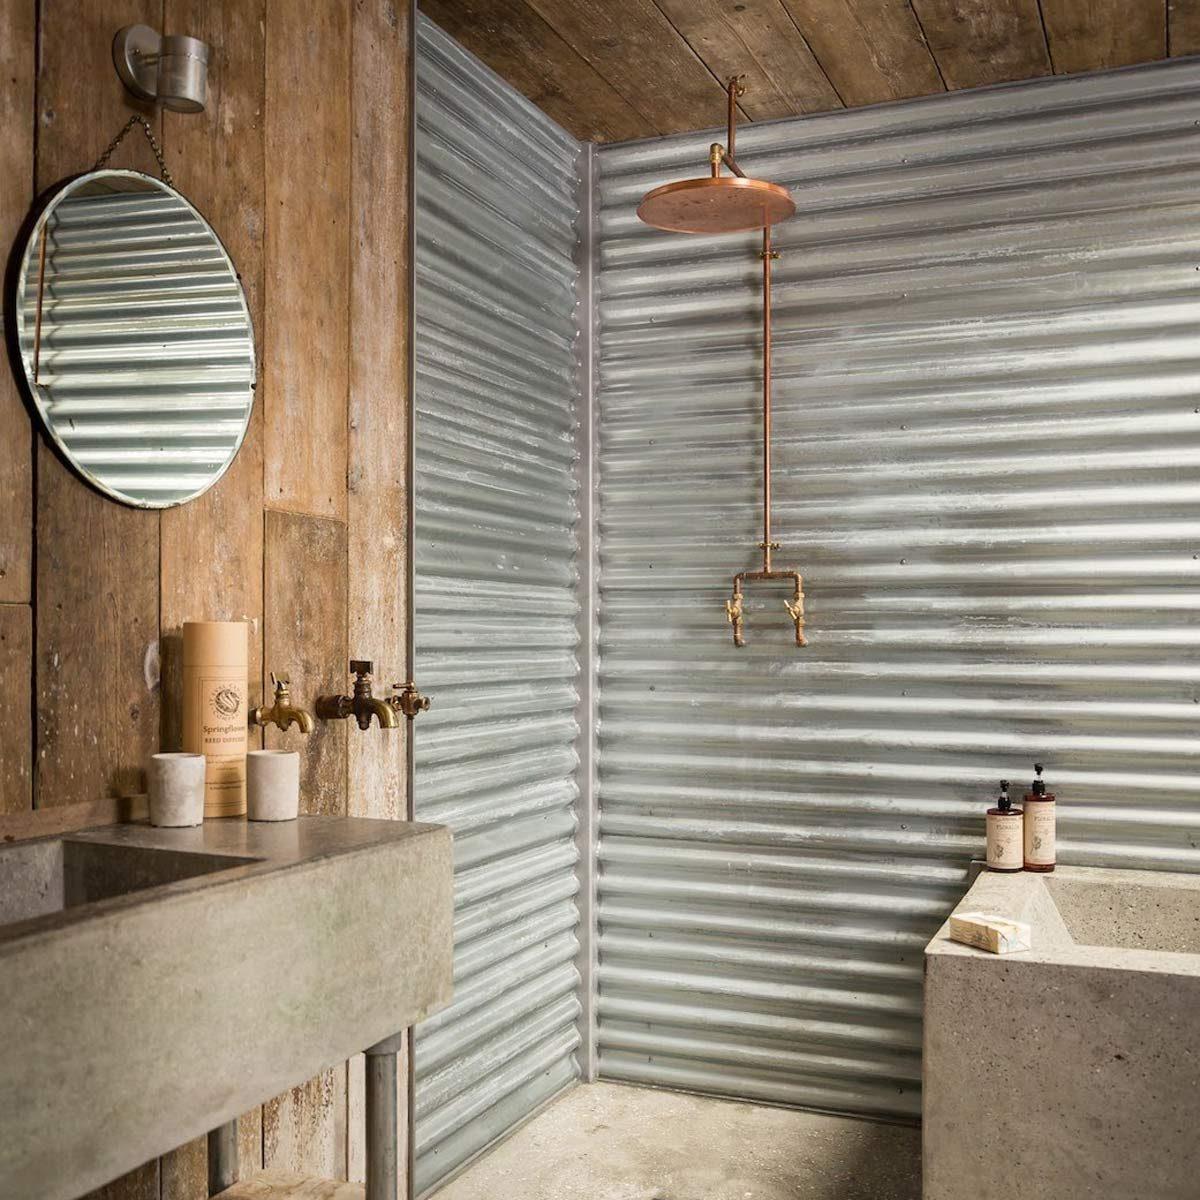 corrugated metal bathroom walls